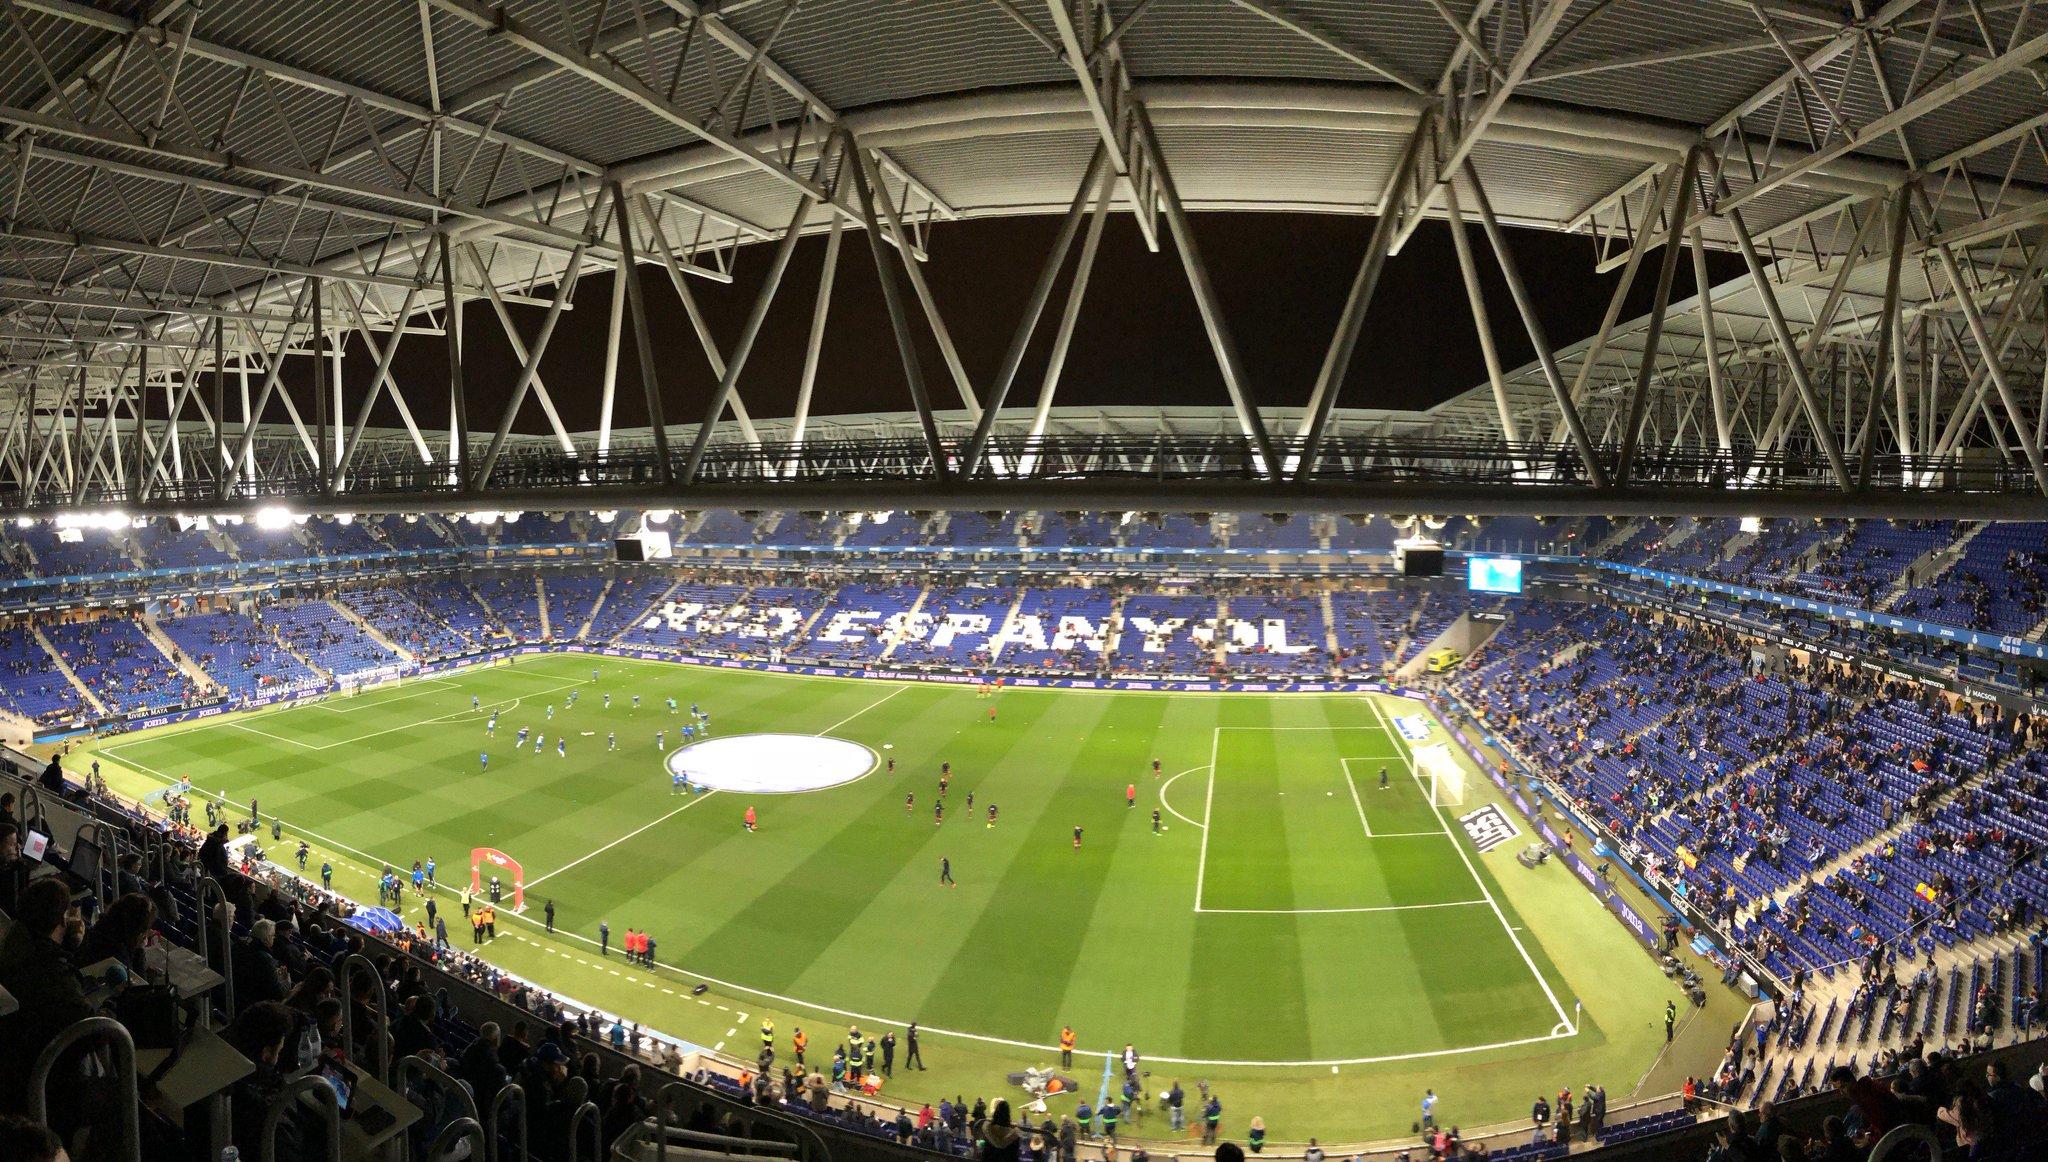 ⌚ Faltan 10 minutos para que comience el derbi! ���� #ForçaBarça #CopaBarça https://t.co/5PscKGwFSo